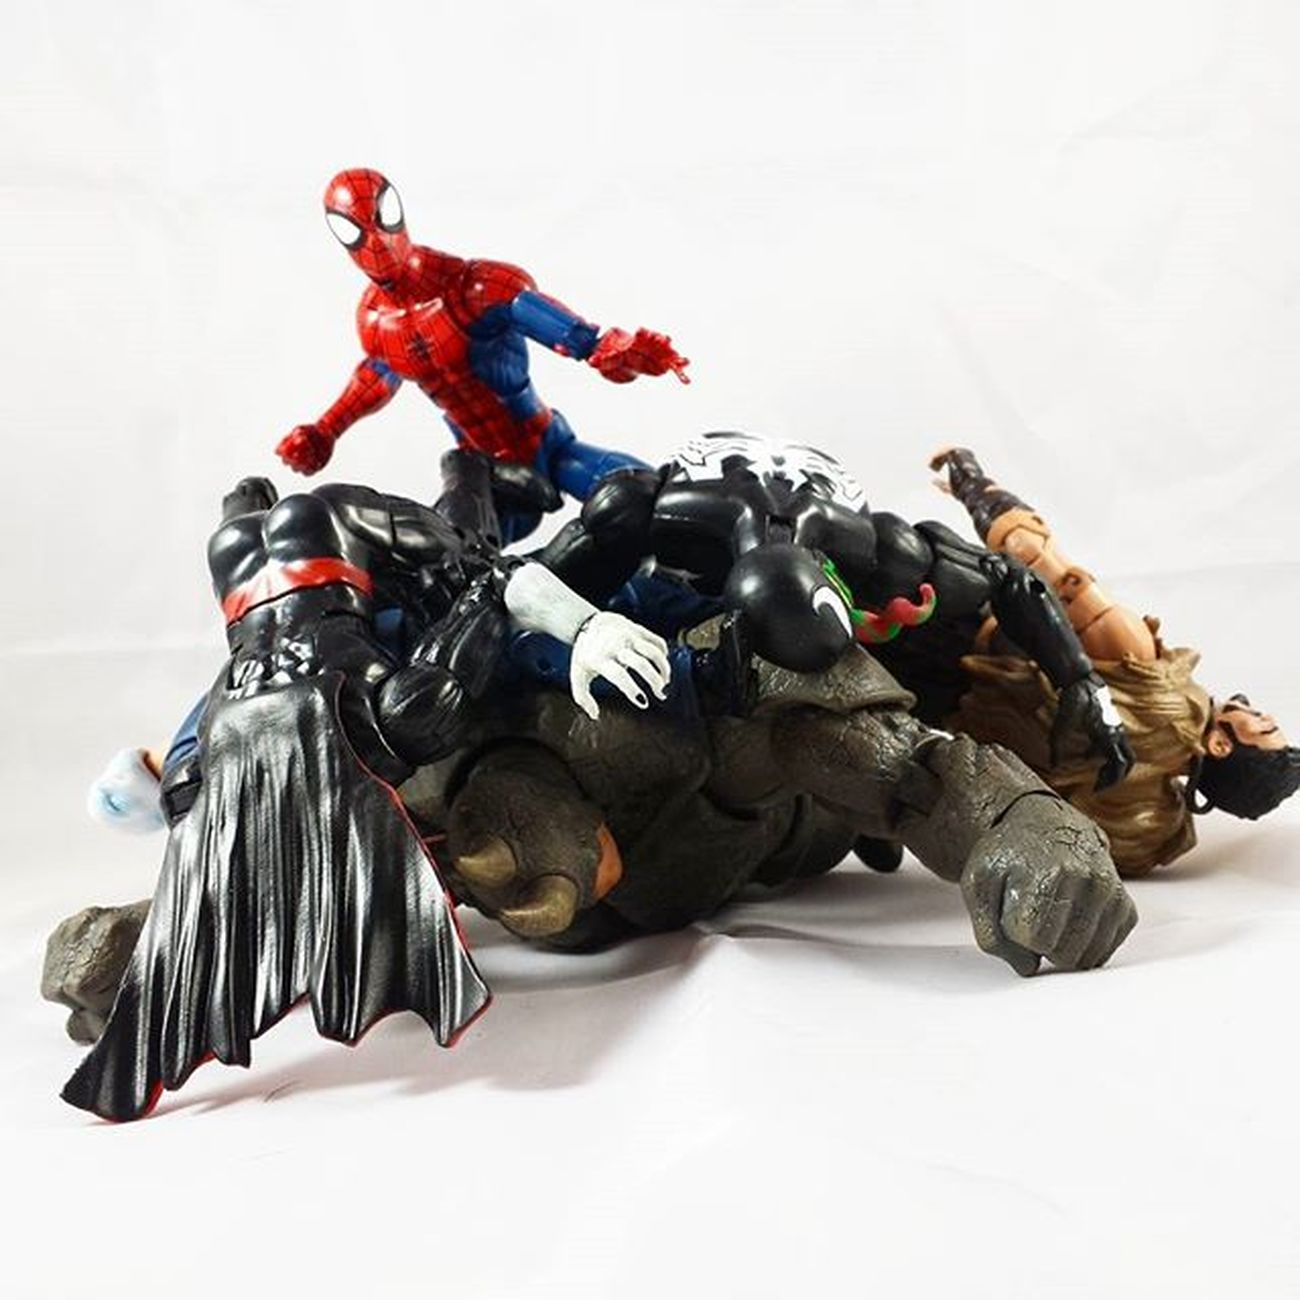 Spiderman Morbius Chameleon Jackolantern Kraventhehunter Venom Rhino Marvel Marvellegends Marvelcomics Toys Toyphotography Toypizza Toysarehellasick Toycollector Toycommunity Toycollection Thefigureverse Ata_dreadnoughts ATA_MARVEL ACBA Acbafam Articulatedcomicbookart